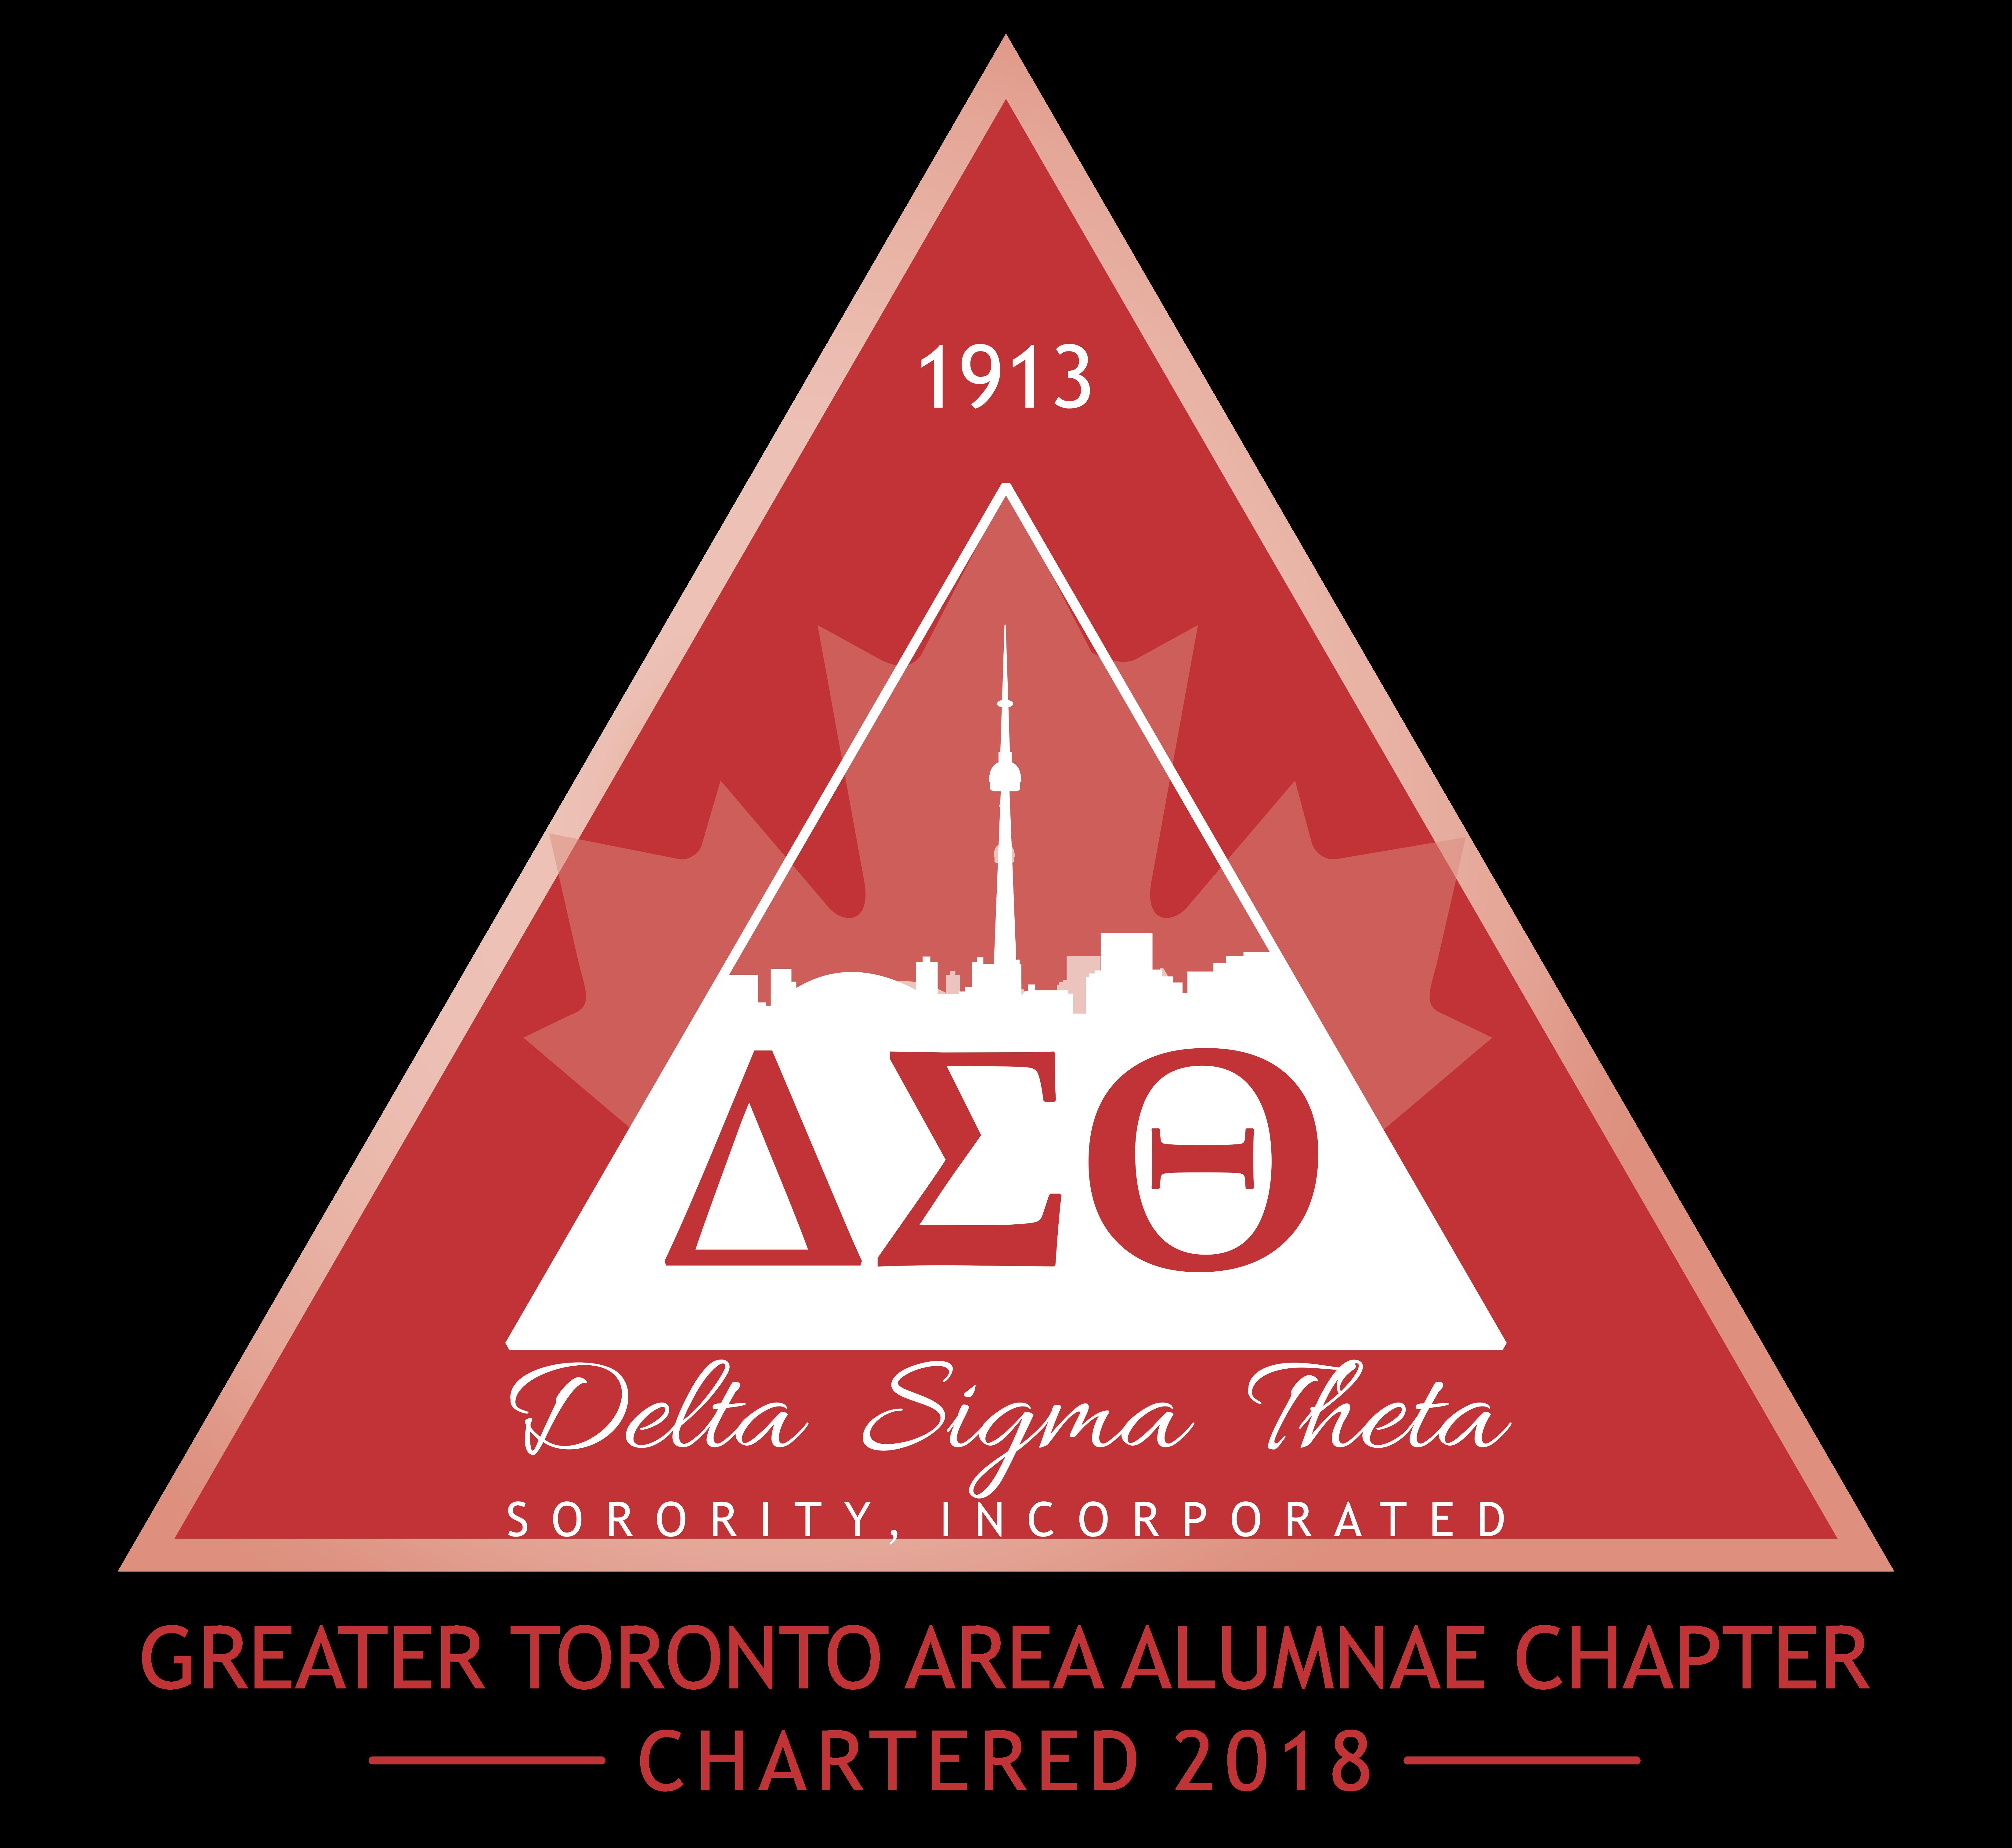 Delta Sigma Theta Sorority, Incorporated.